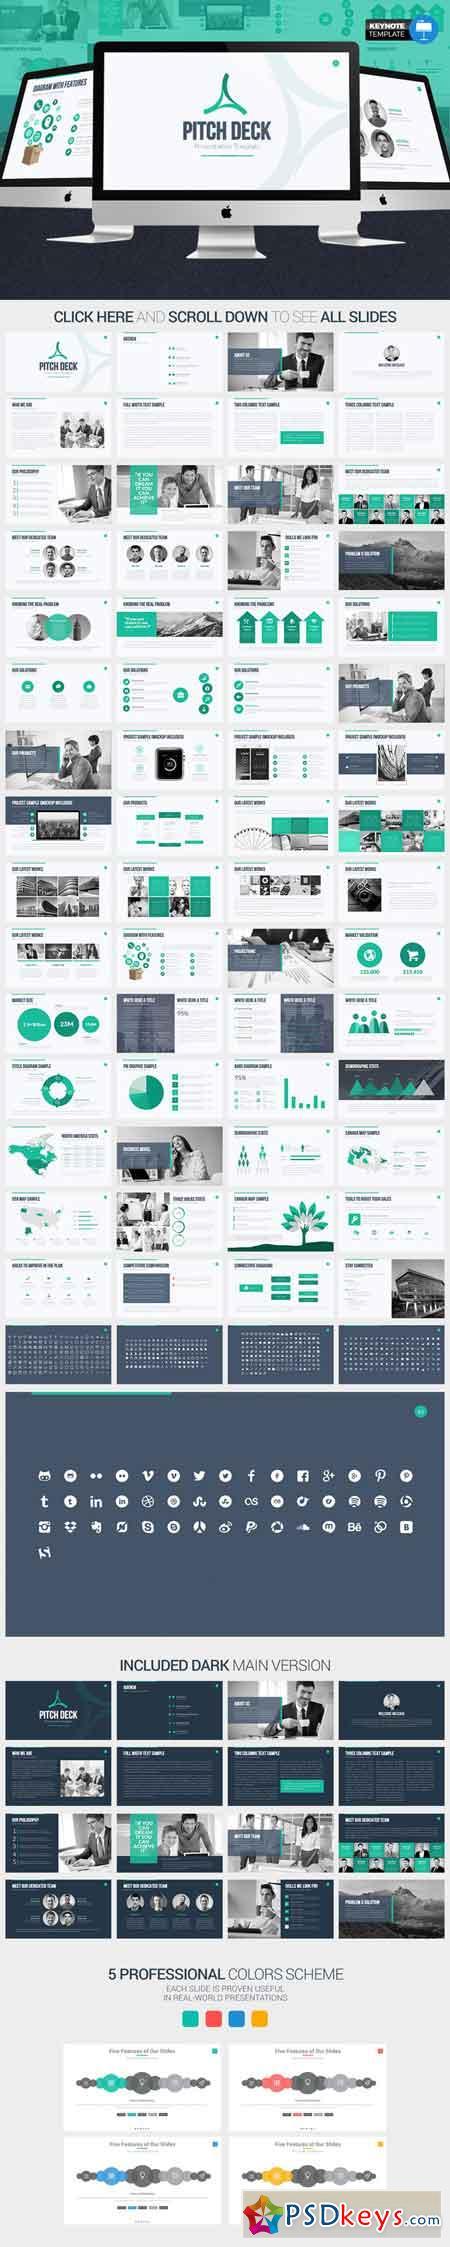 Pitch Deck Keynote Template Free Download Photoshop - Keynote deck templates